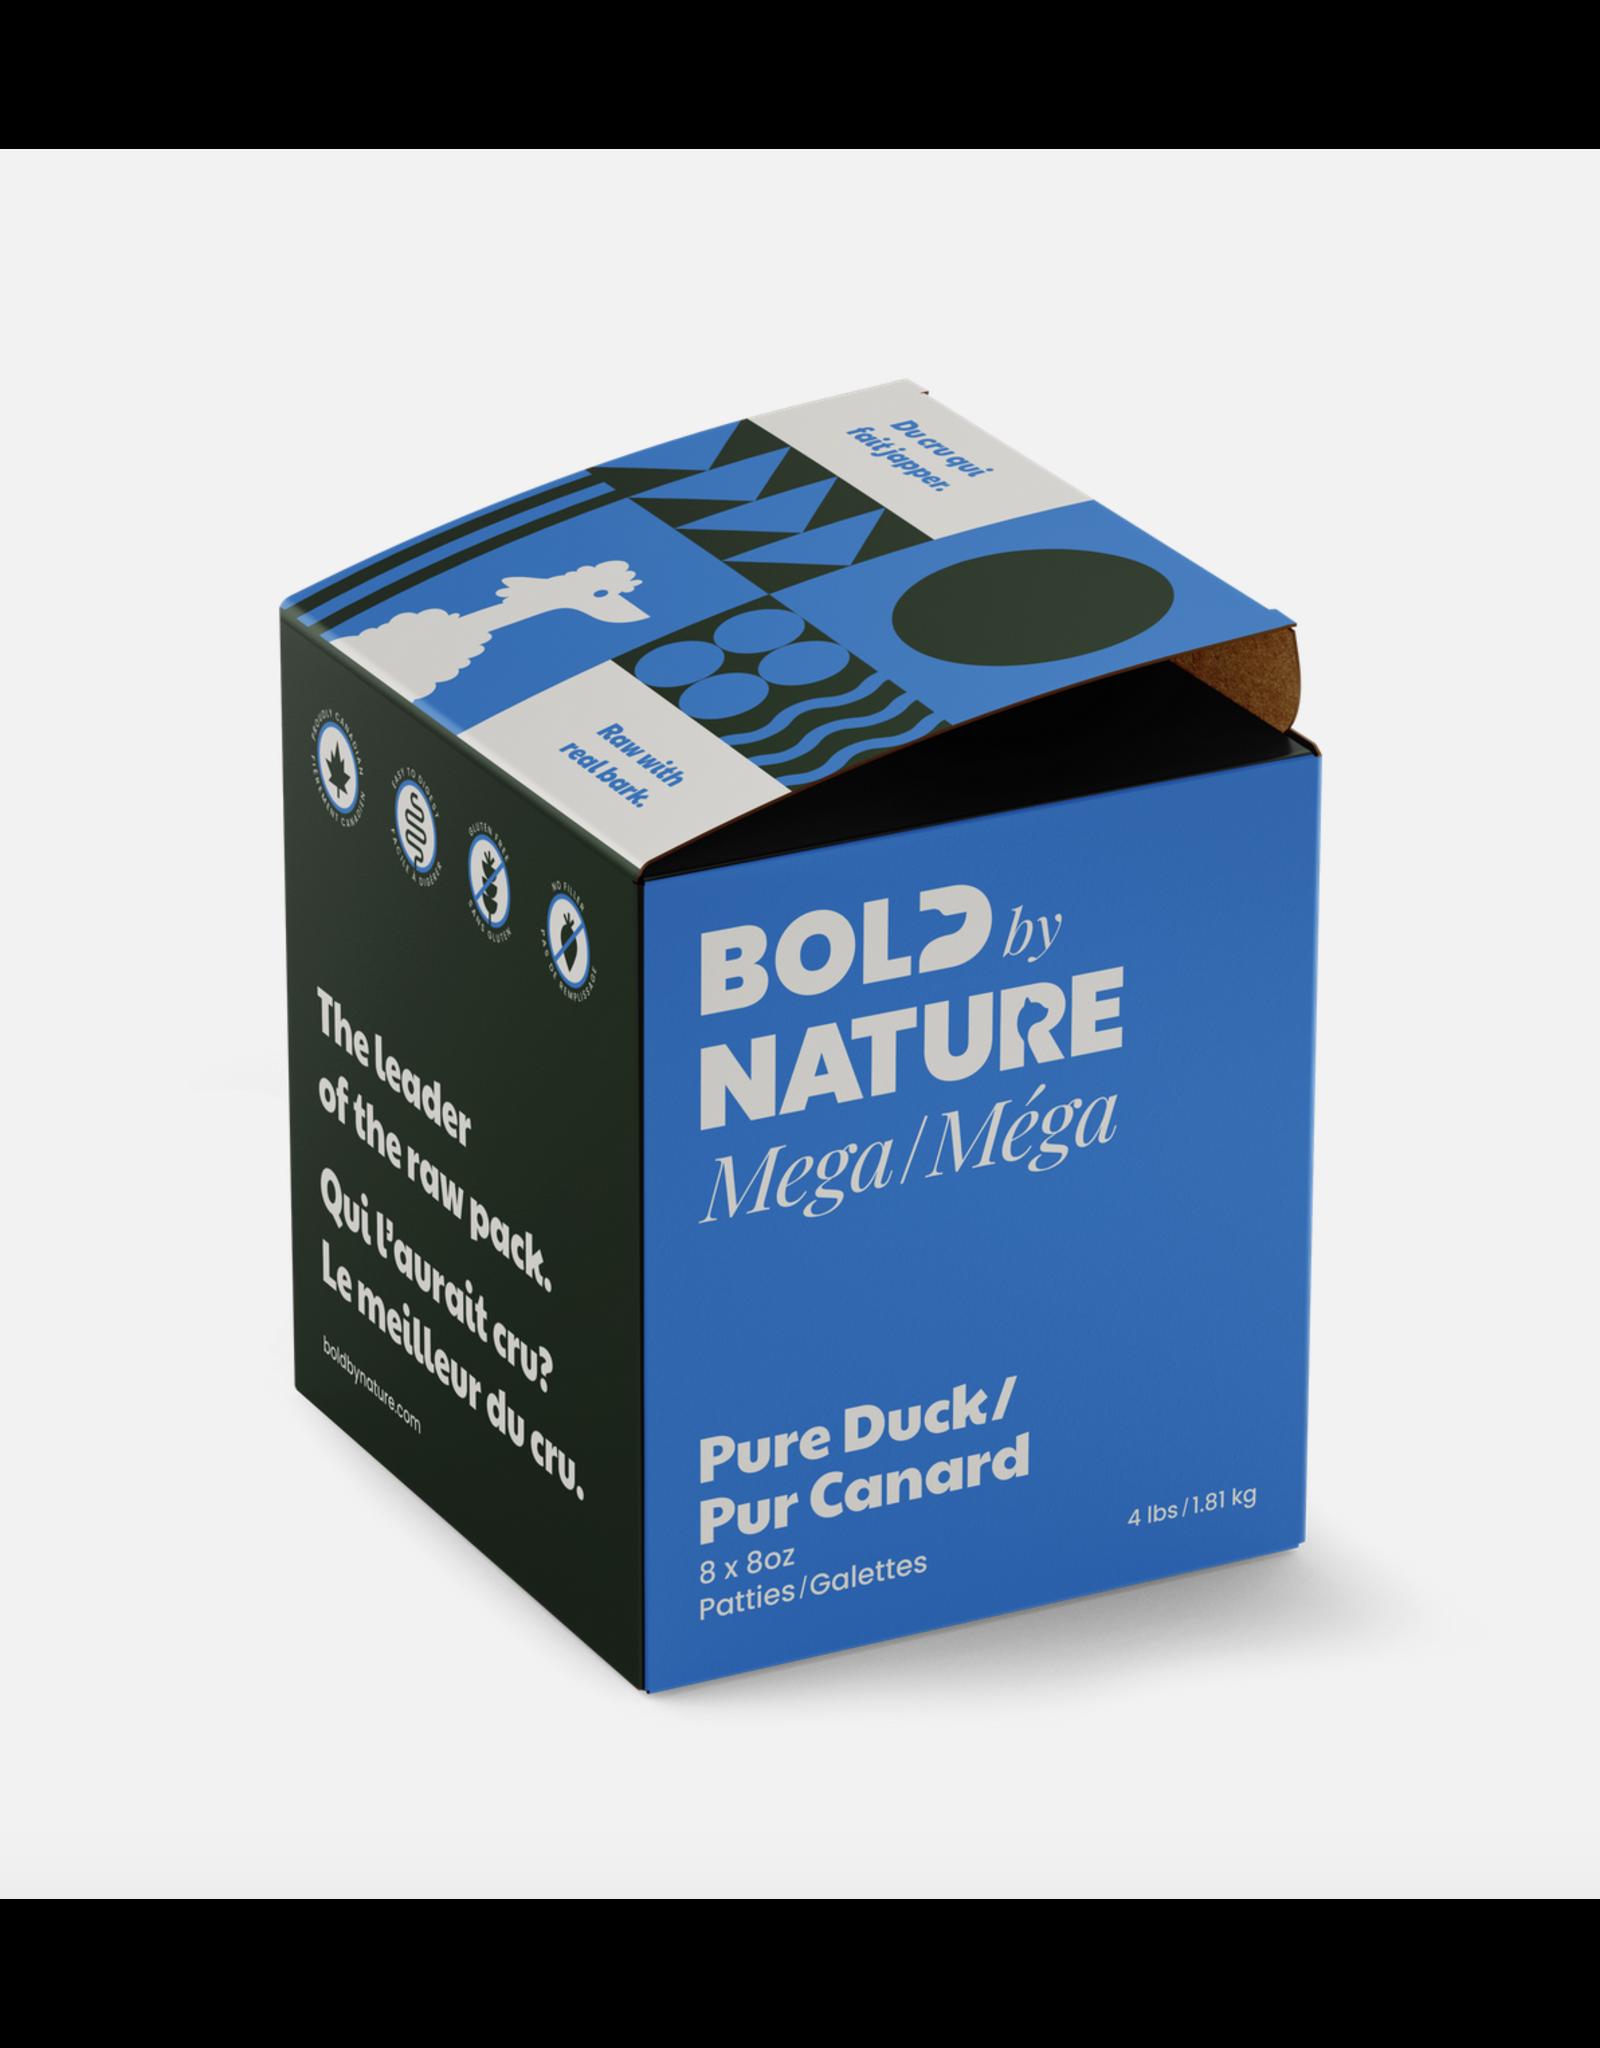 Mega Dog Bold by Nature - Mega - Pure Duck - 4lb Box